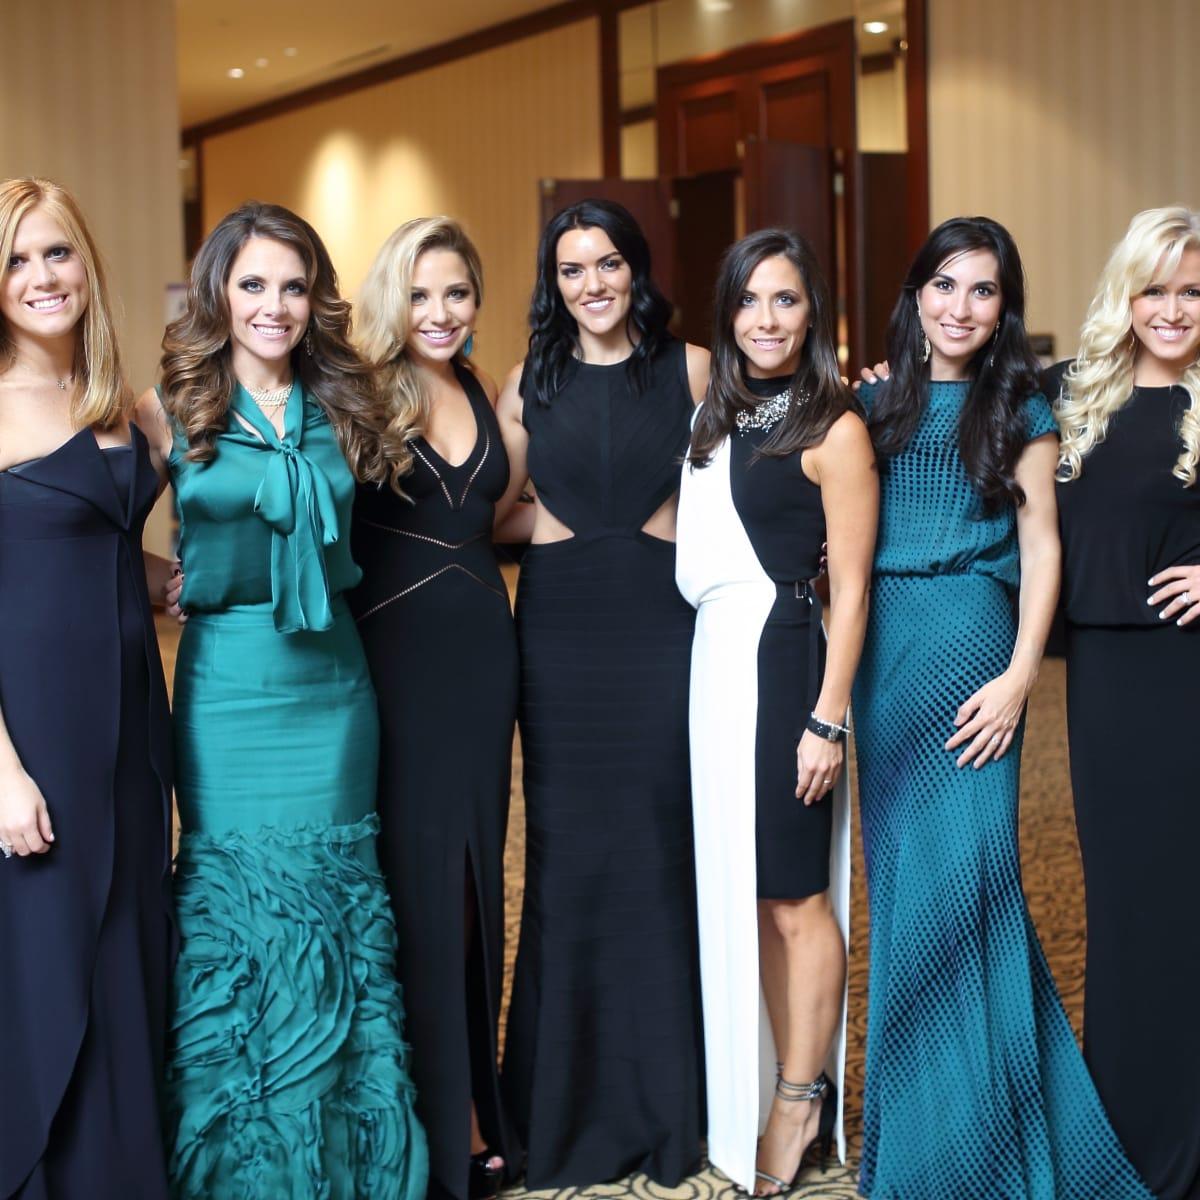 Big Brothers Big Sisters gala 2015 Amber Heartland, JoAnna Marks, Bria Wall, Megan Cushing, Hannah McNair, Alexandra Ochoa, Erica Graham